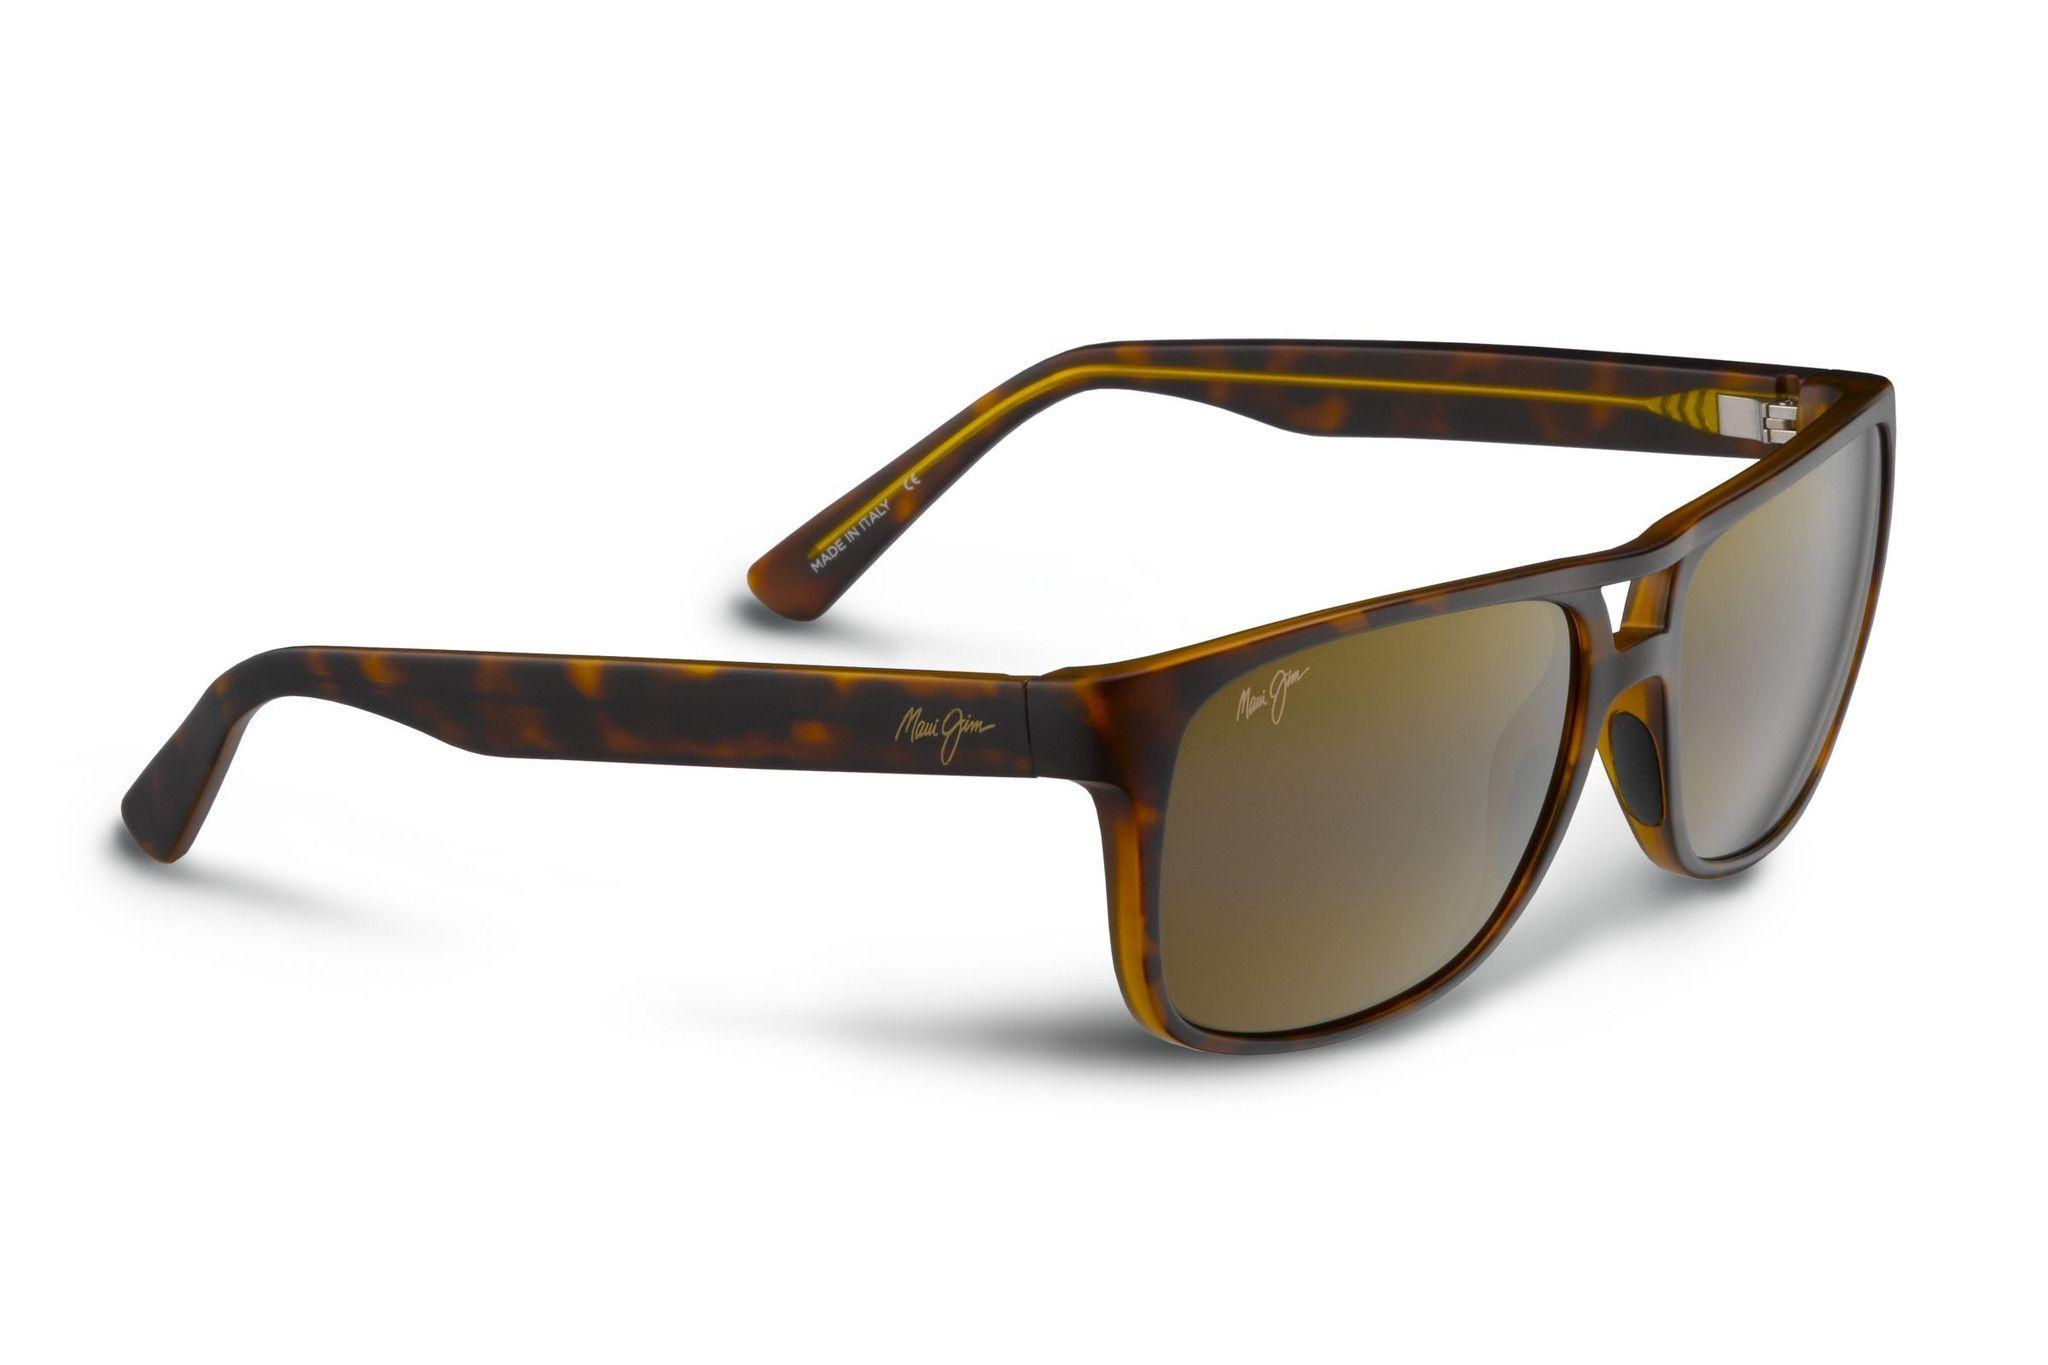 4b9cef2926a94 Maui Jim Waterways Sunglasses   Products